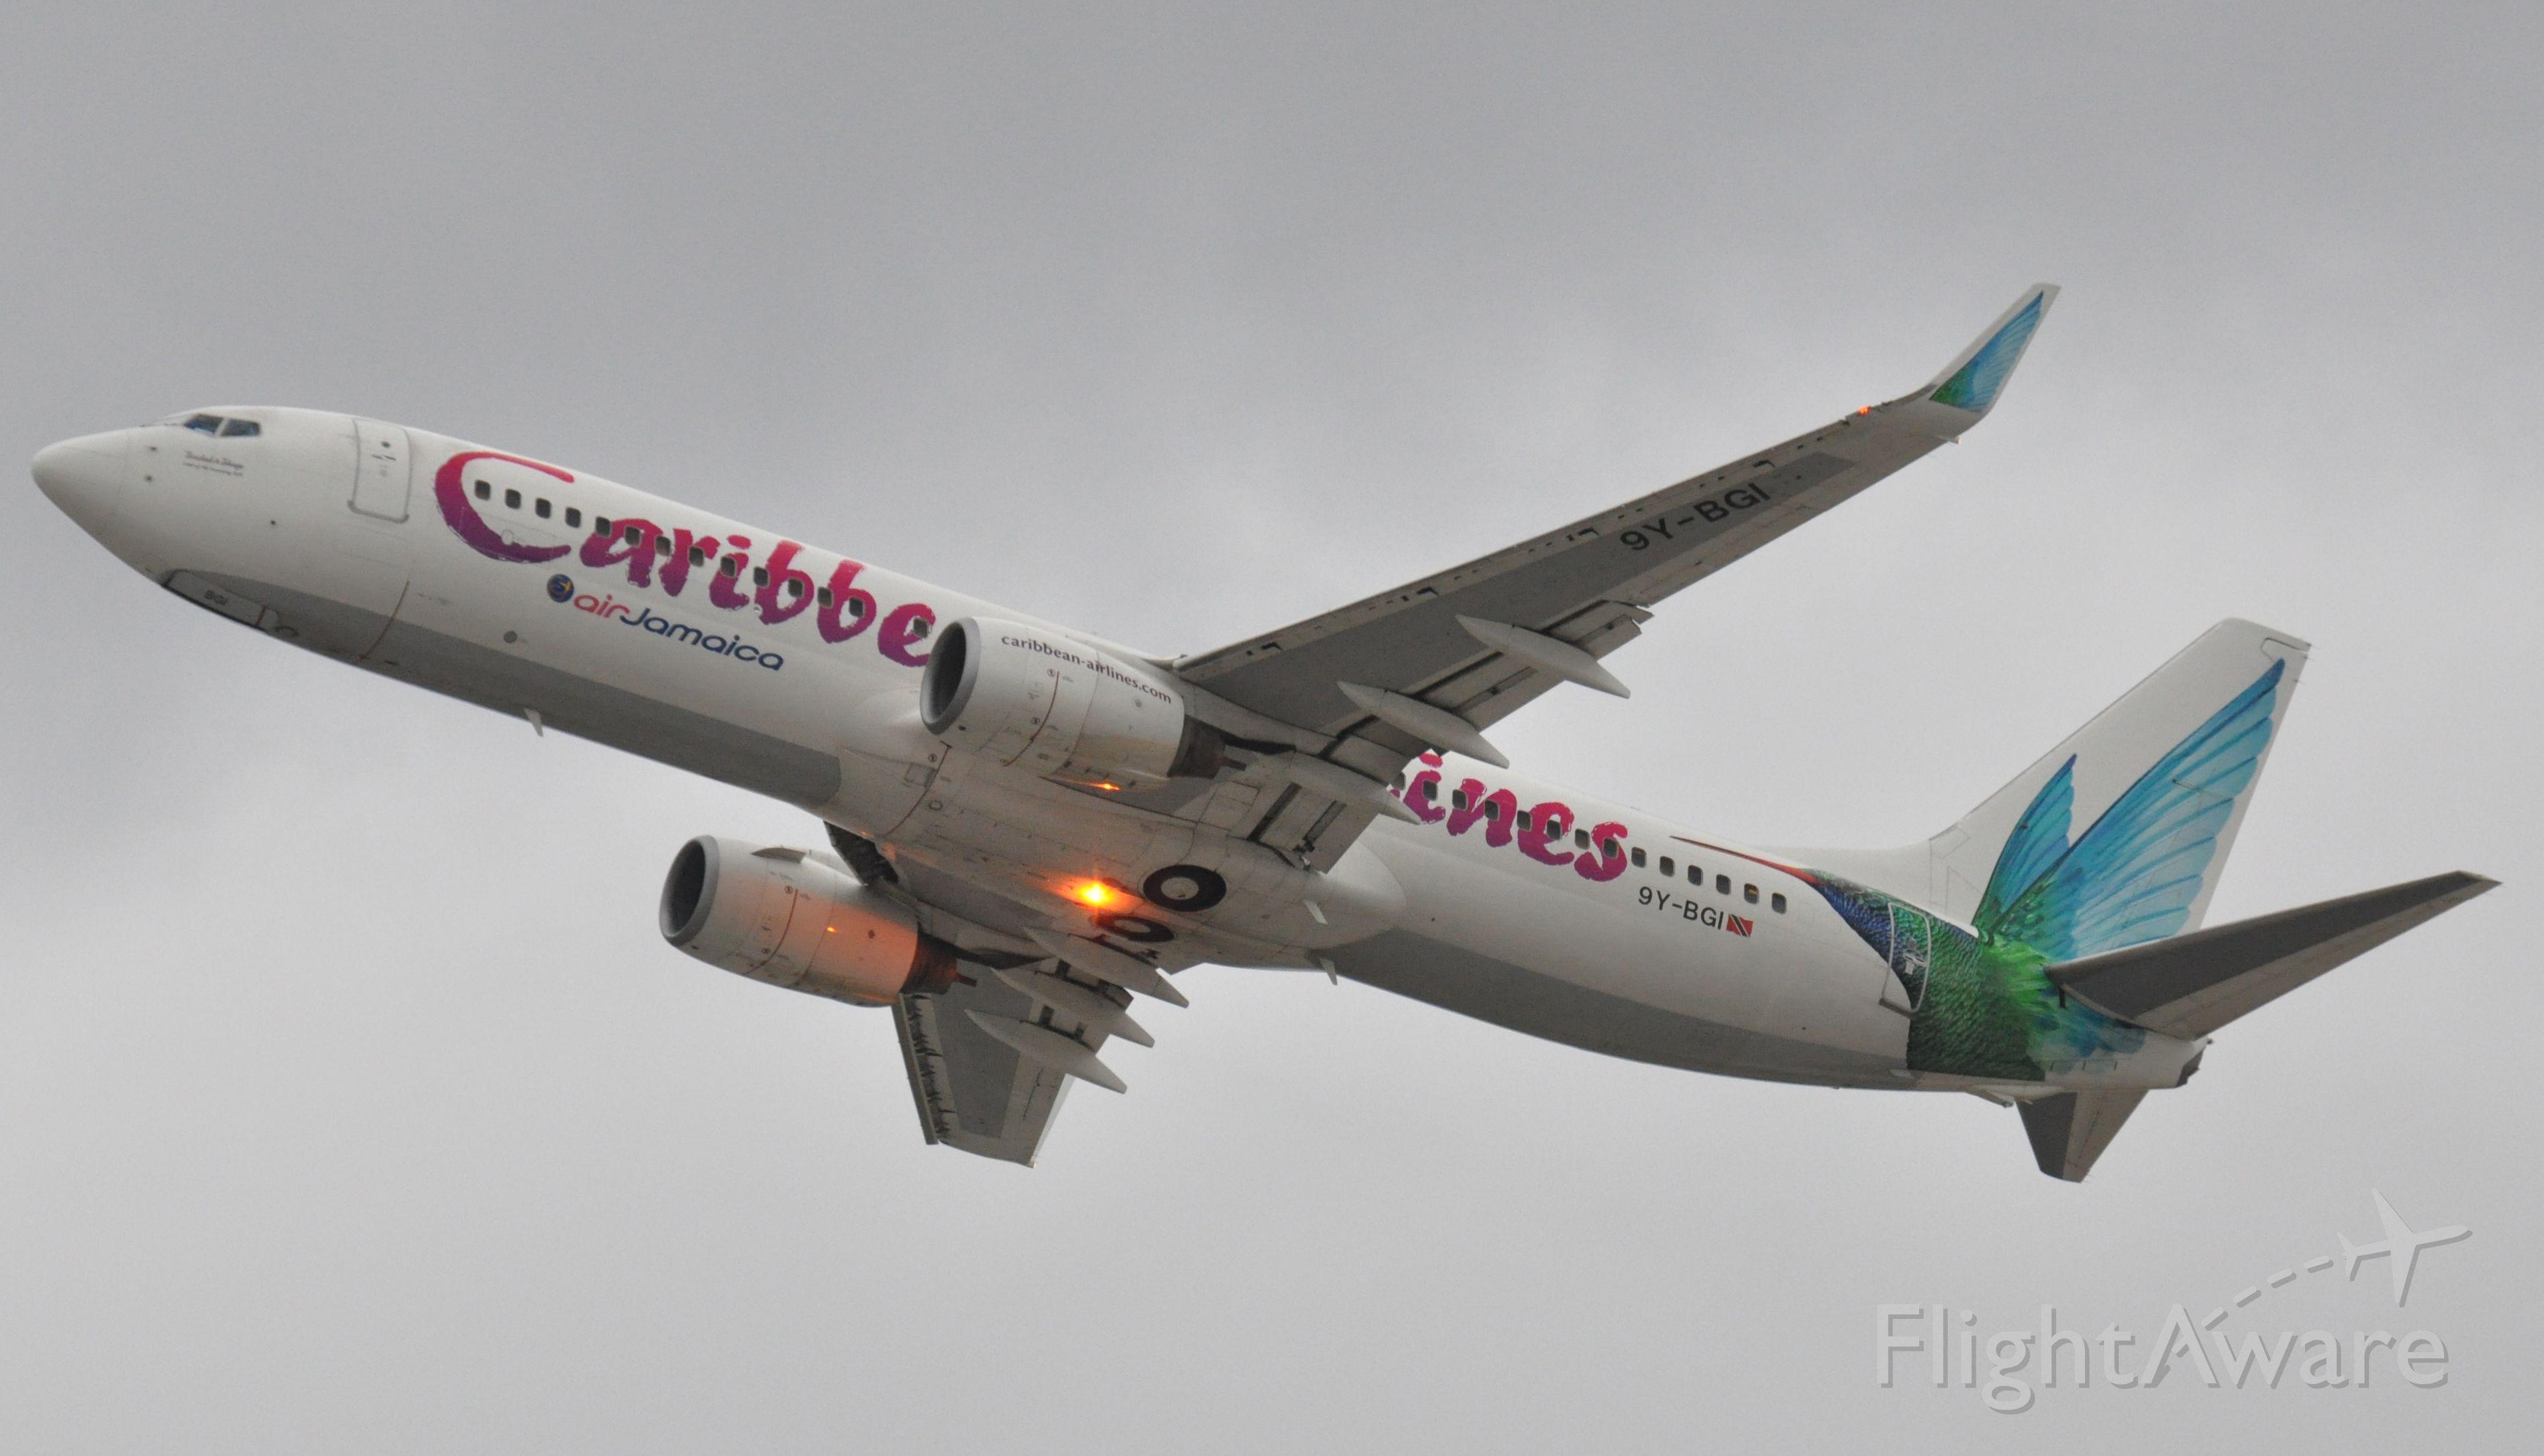 Boeing 737-700 (9Y-BGI) - Imaged on 1/11/12